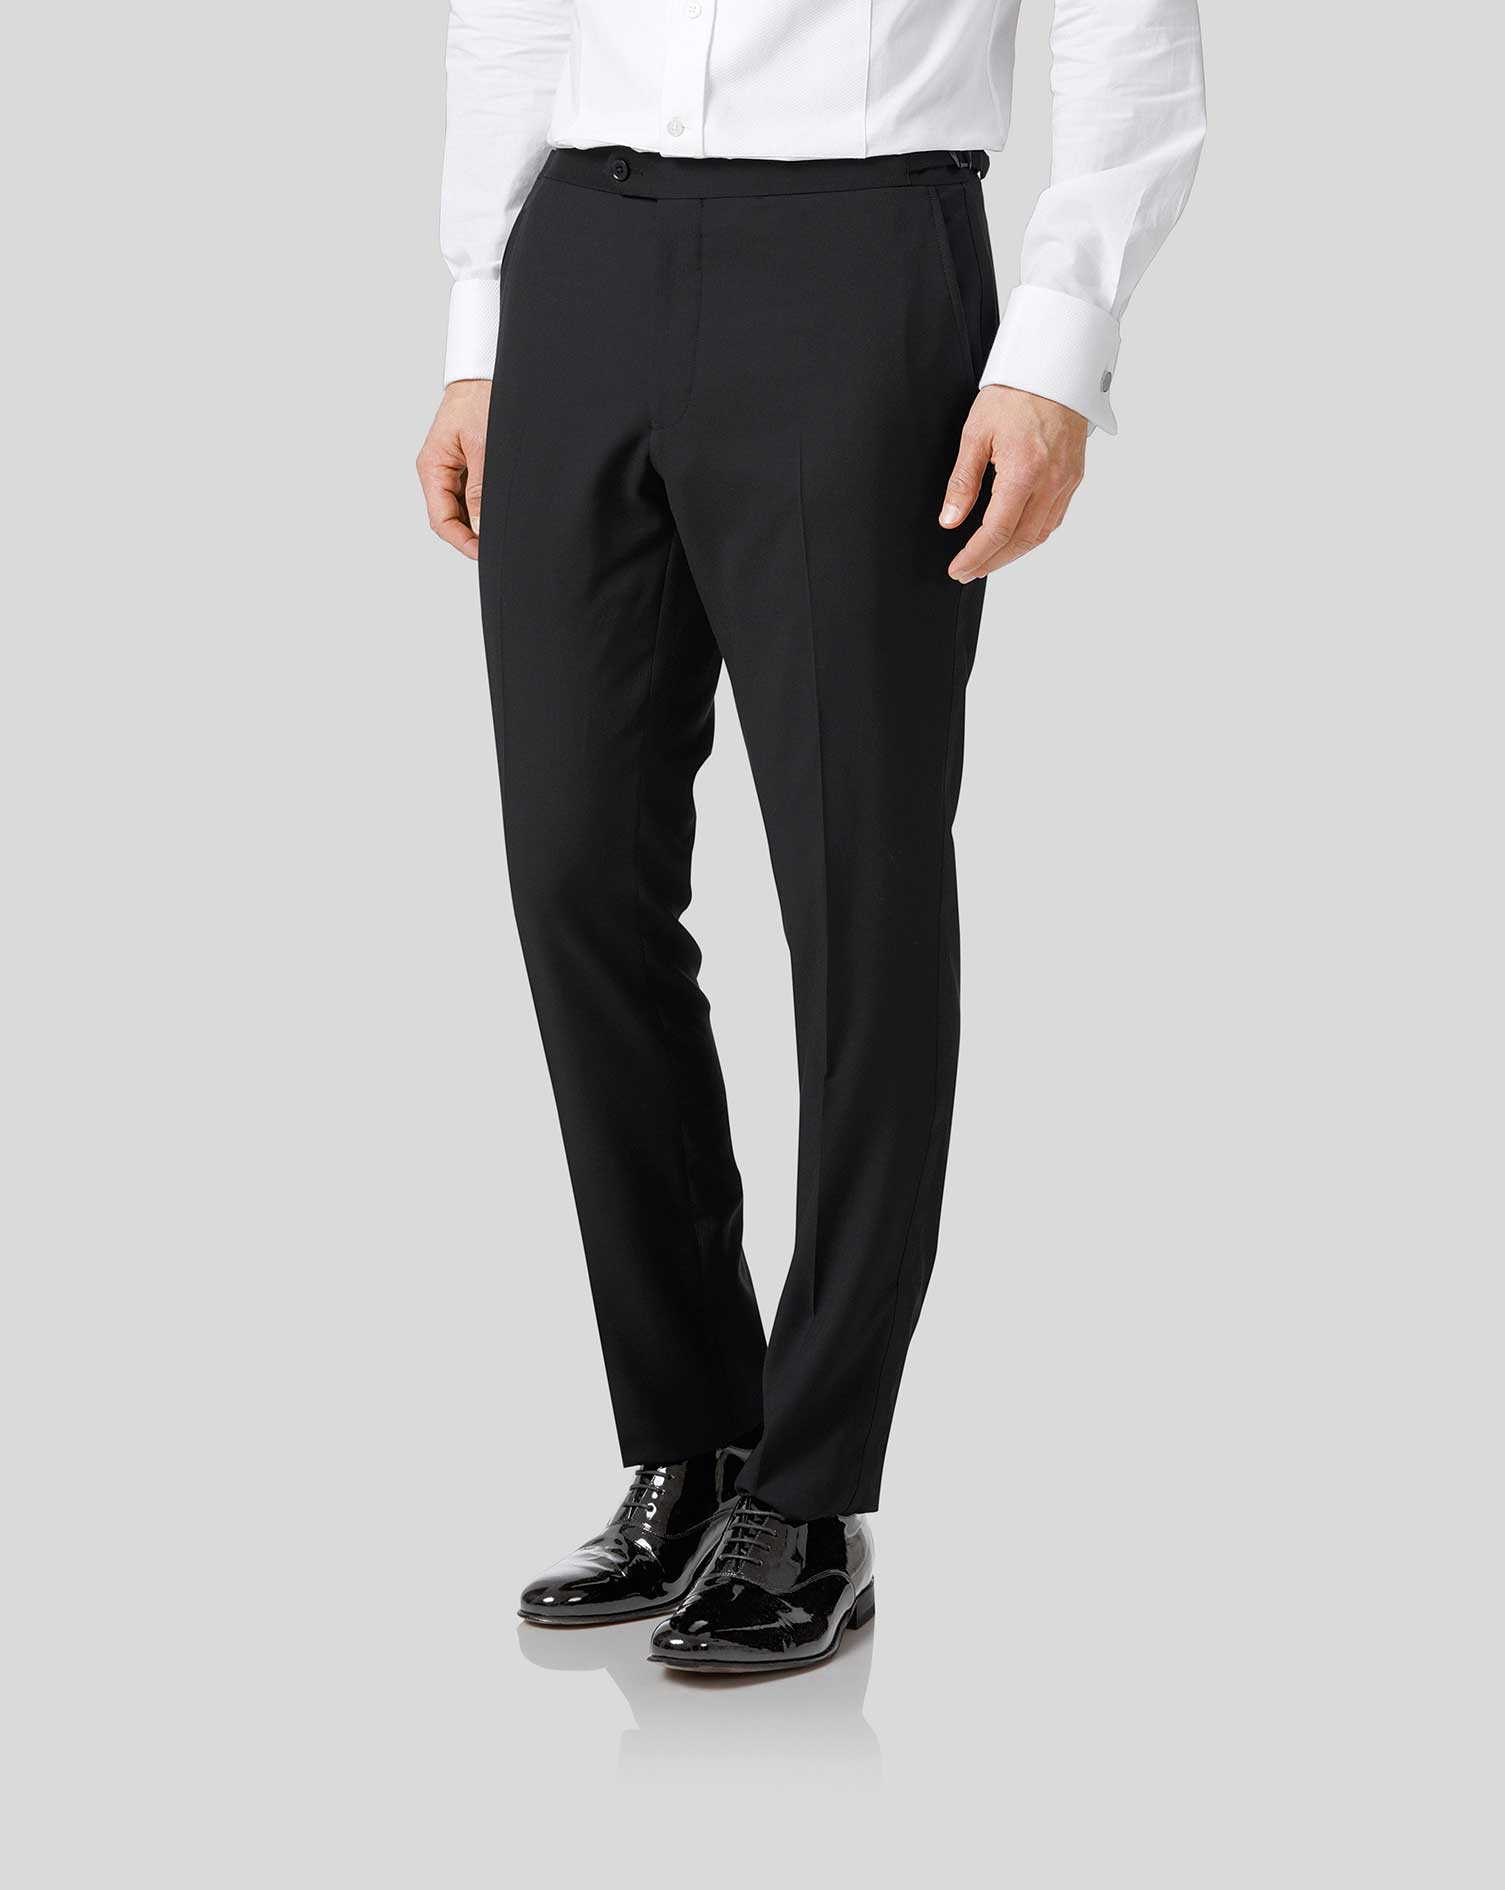 Black Extra Slim Fit Dinner Suit Trouser Size W34 L38 by Charles Tyrwhitt